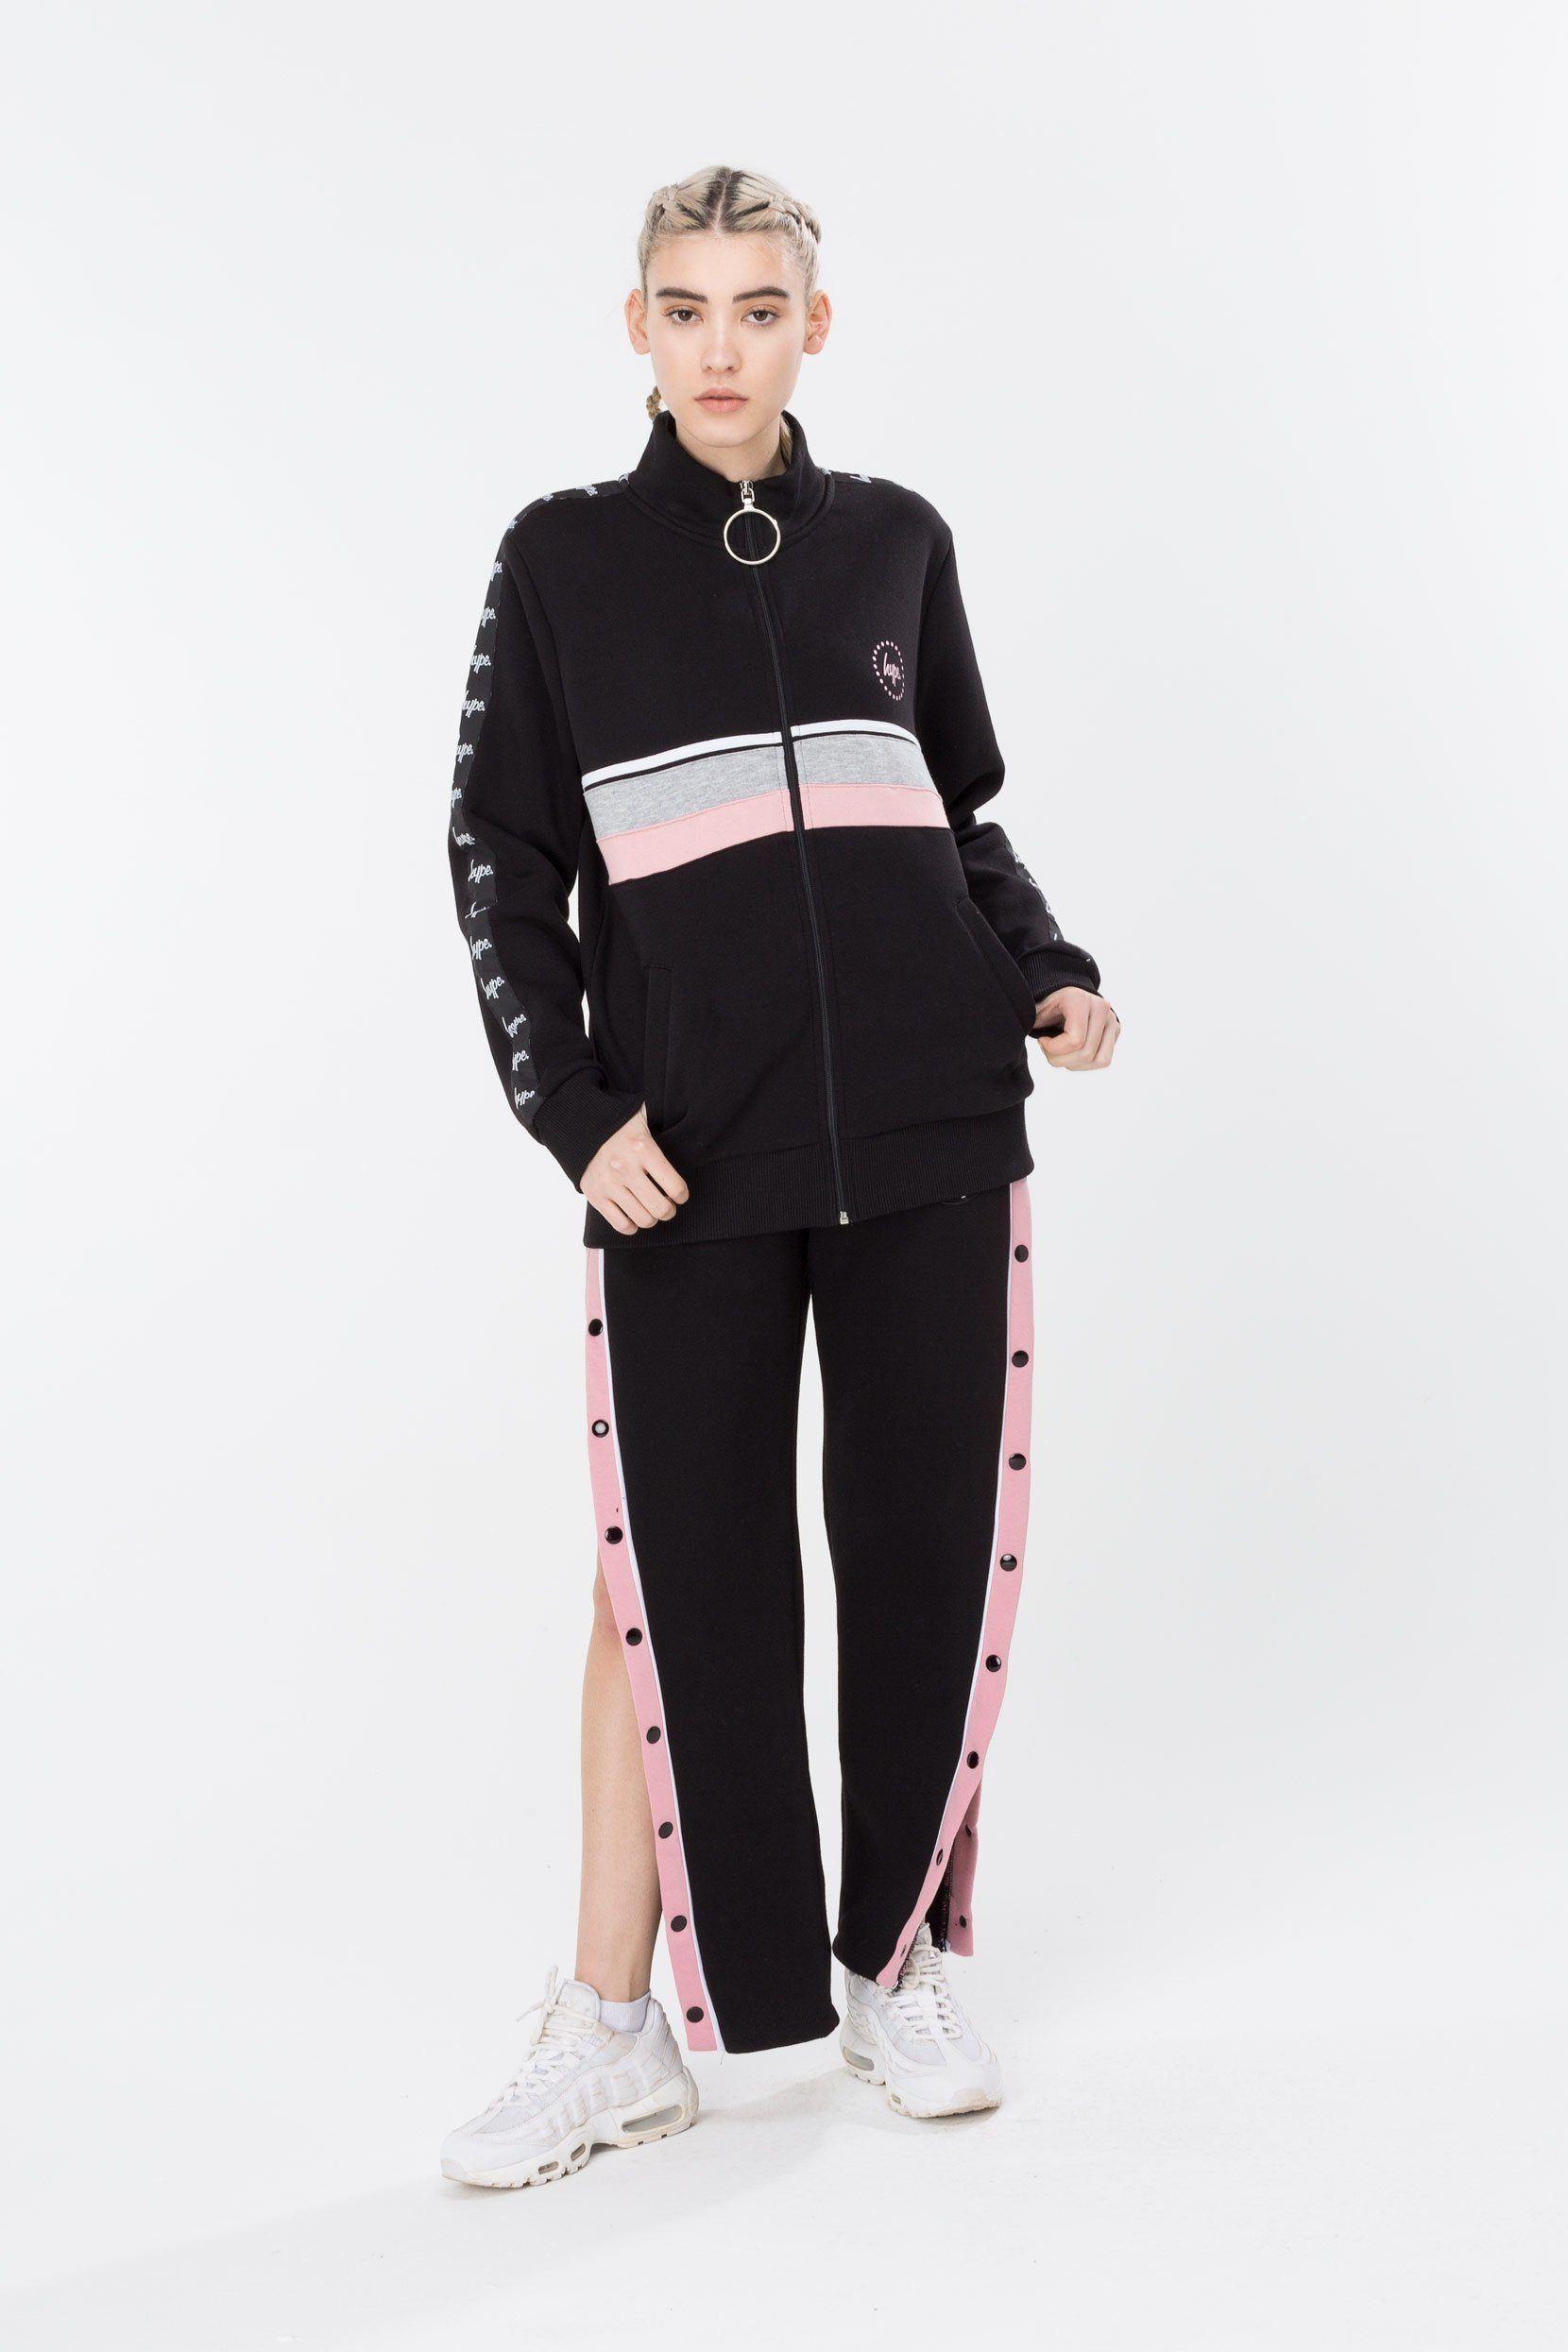 HYPE Black/Grey/Pink Taping Women's Track Jacket